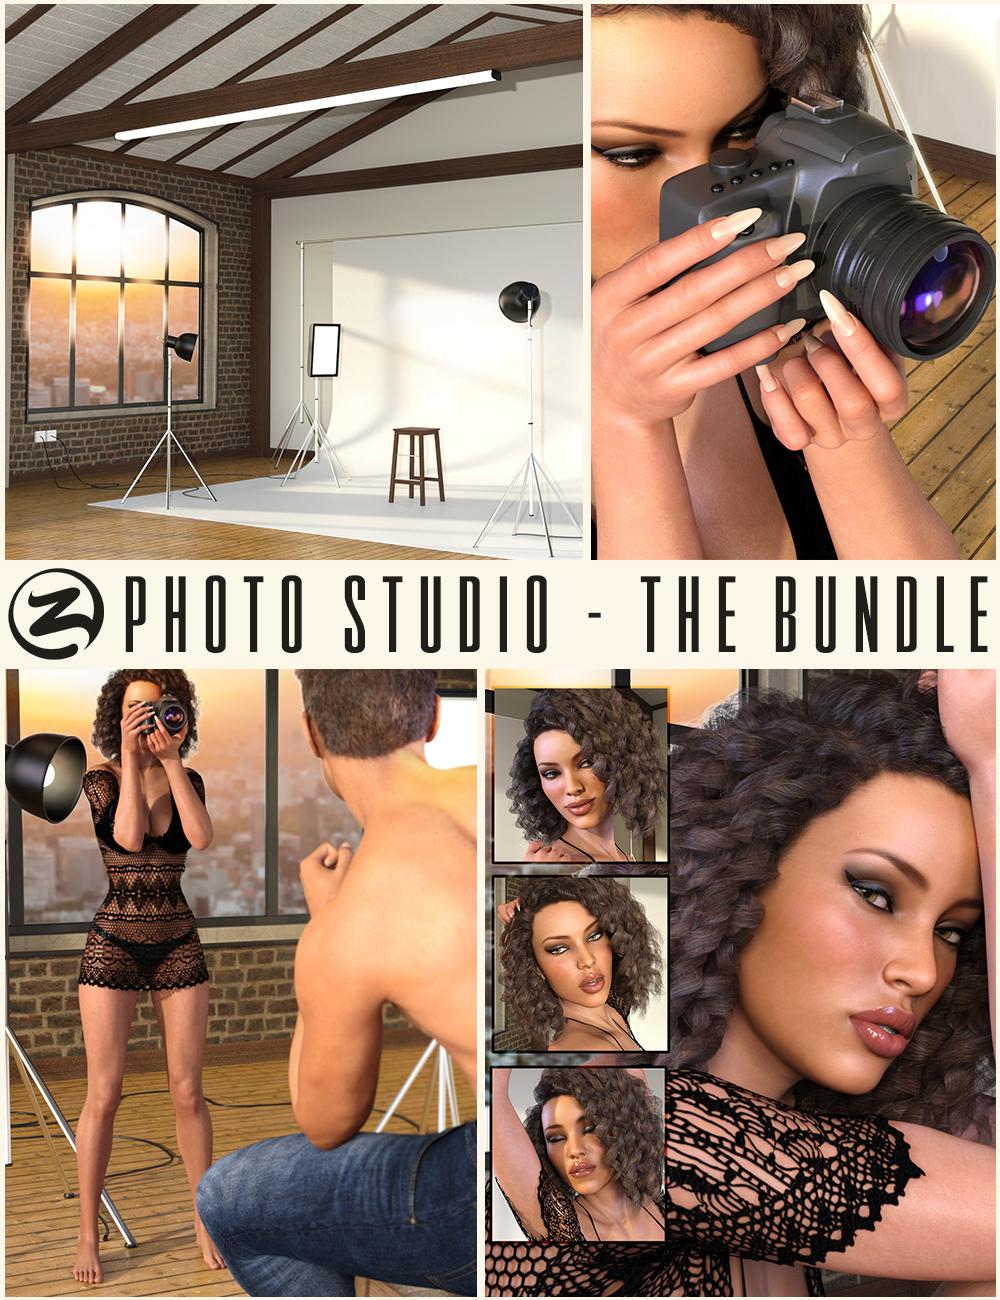 Z Photo Studio Bundle by: Zeddicuss, 3D Models by Daz 3D